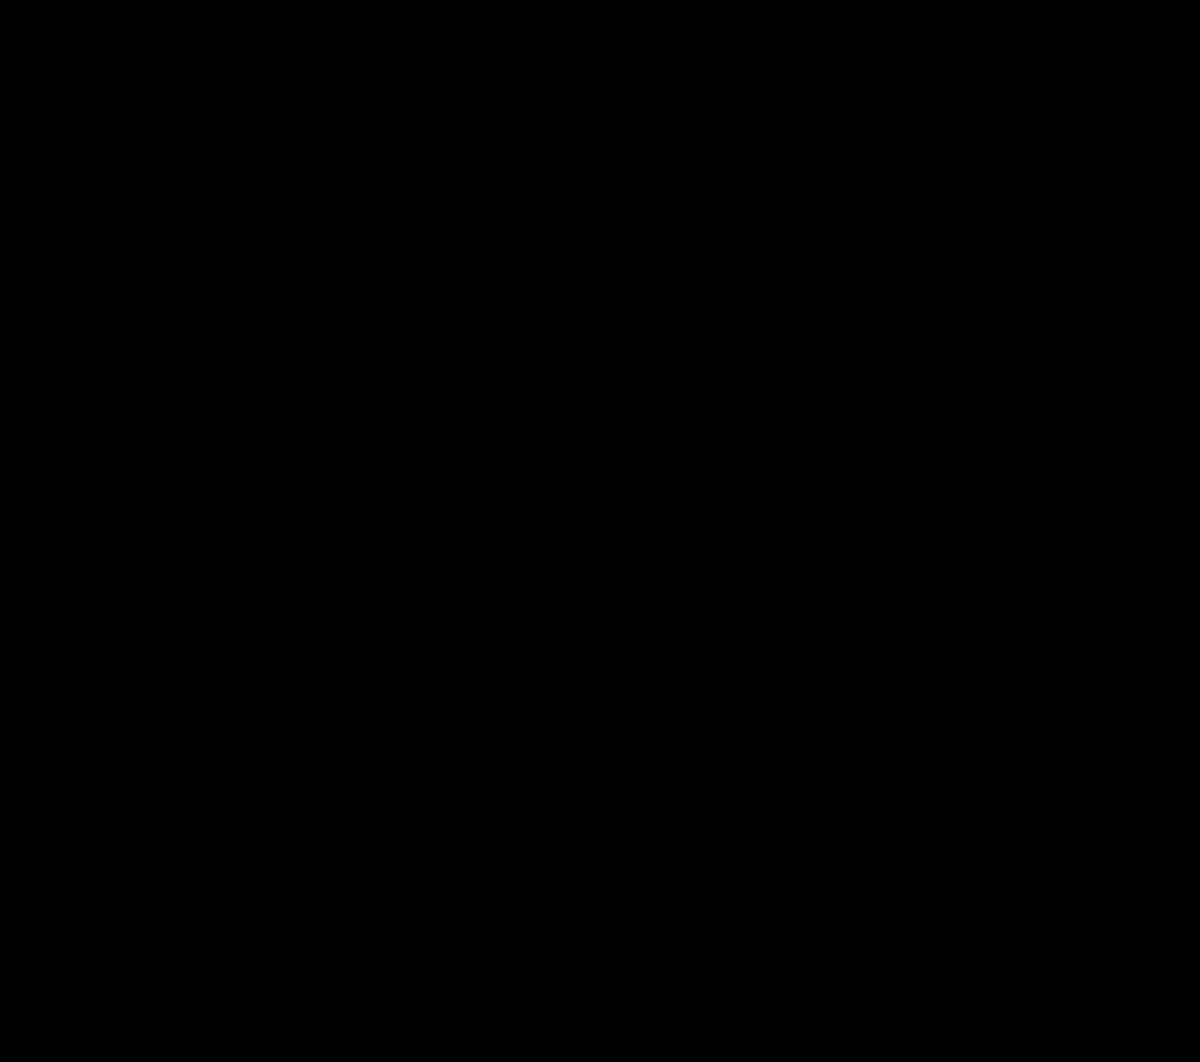 f:id:centuryride0608:20210111173331p:plain